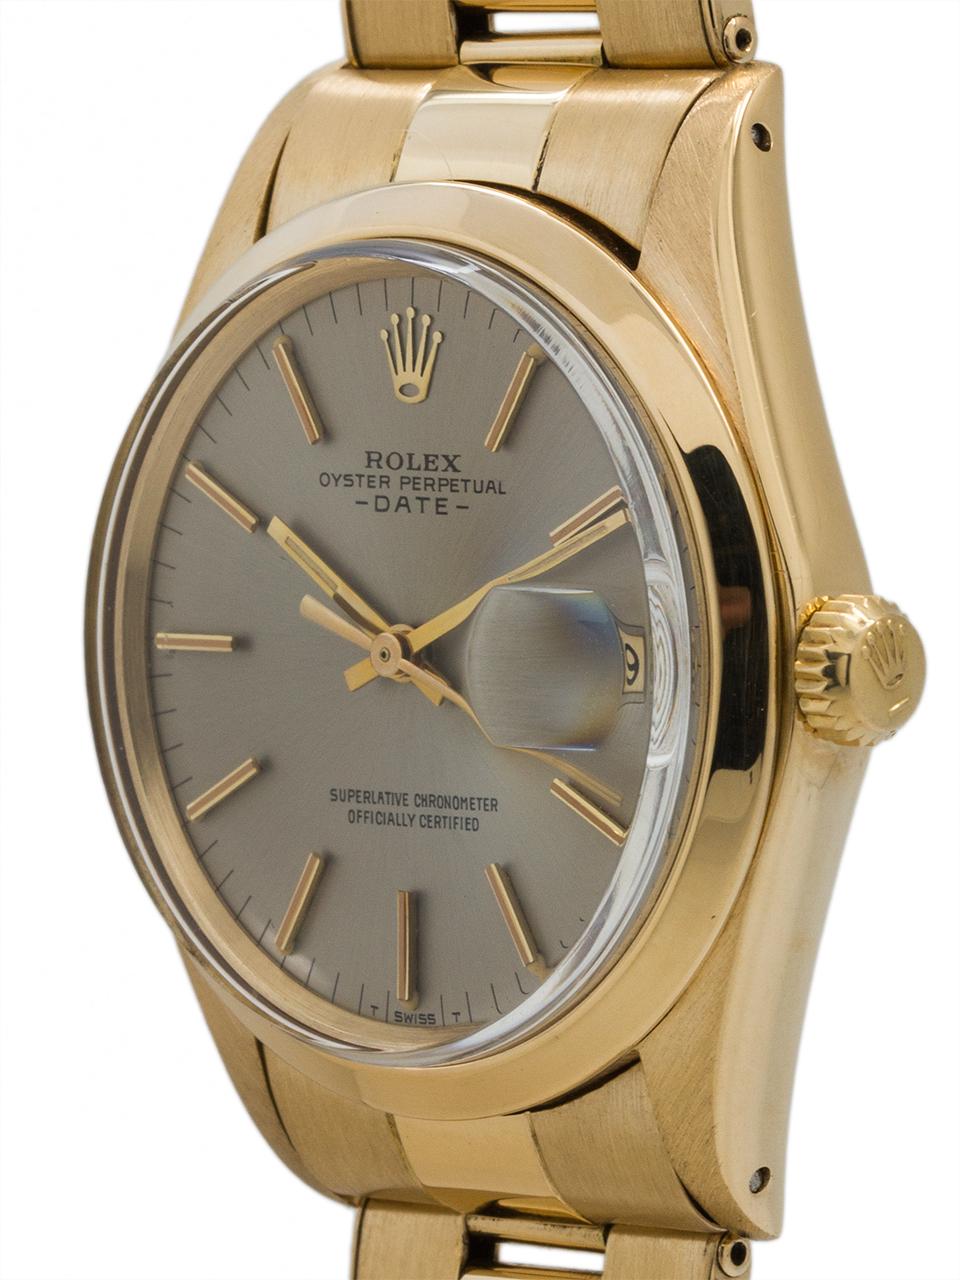 Rolex 18K YG Oyster Perpetual Date ref 1500 circa 1968